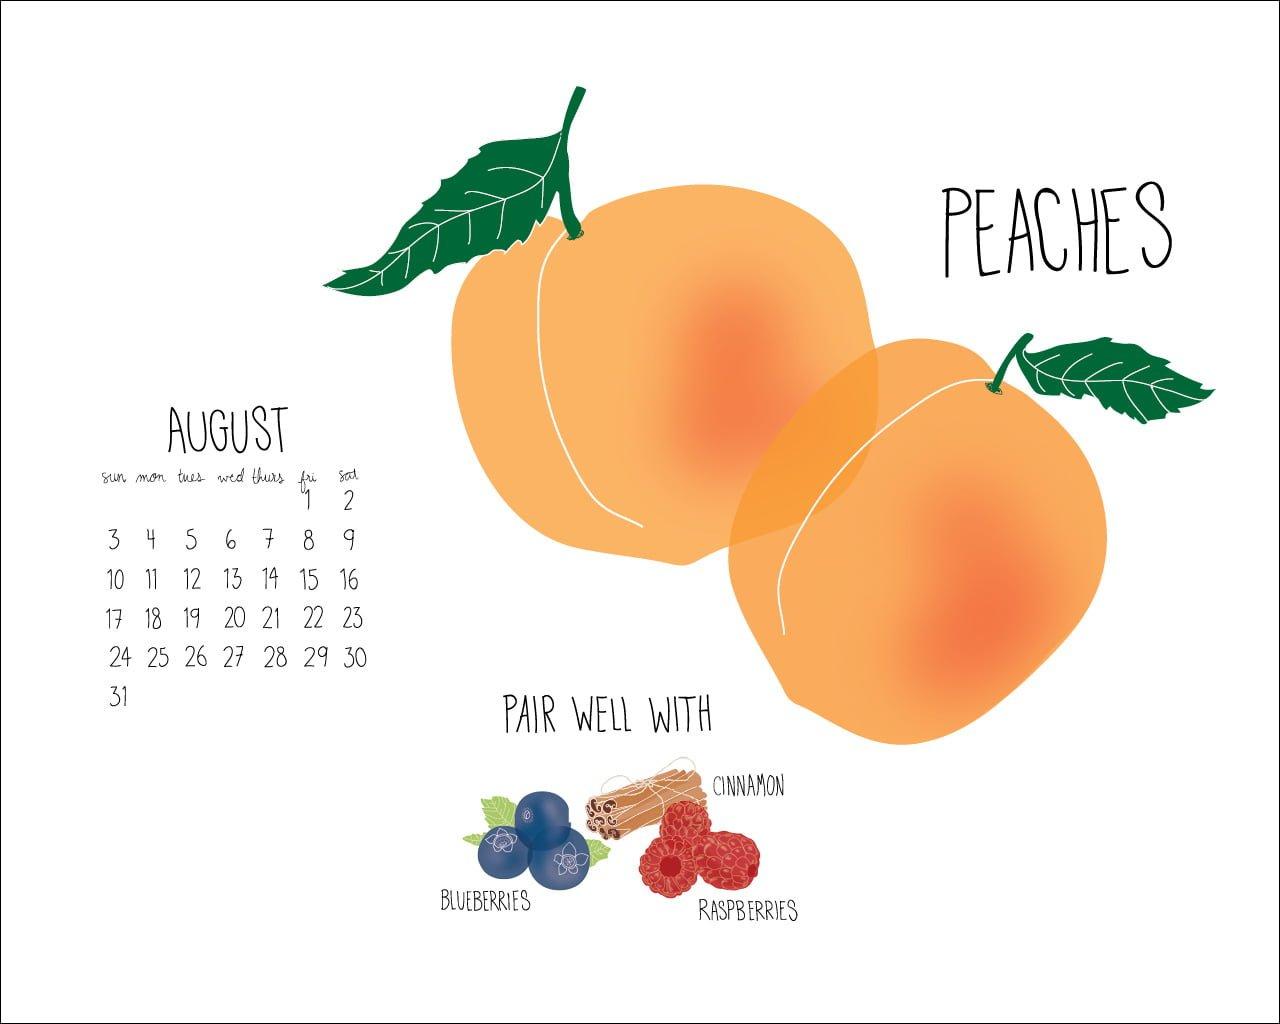 Spud August Peach Desktopcalendar Outline2